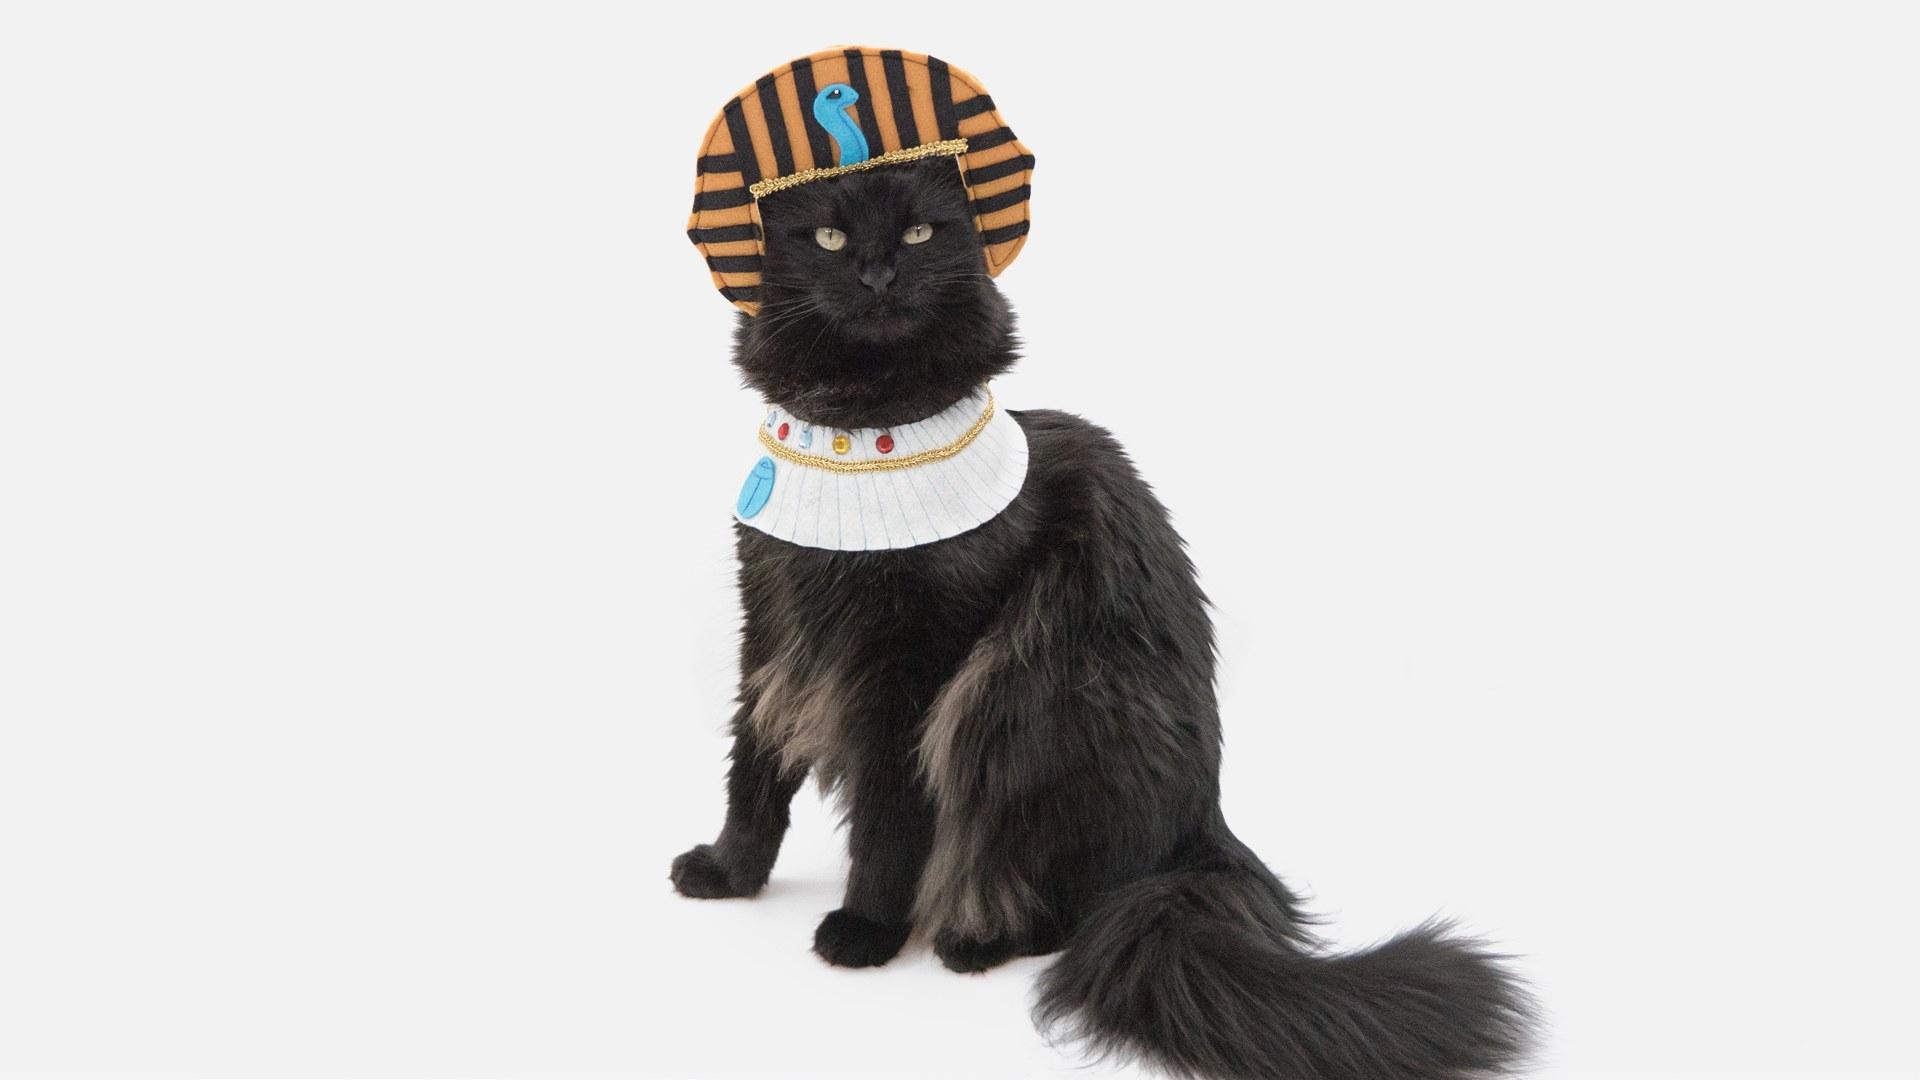 DIY Egyptian Pharaoh costume